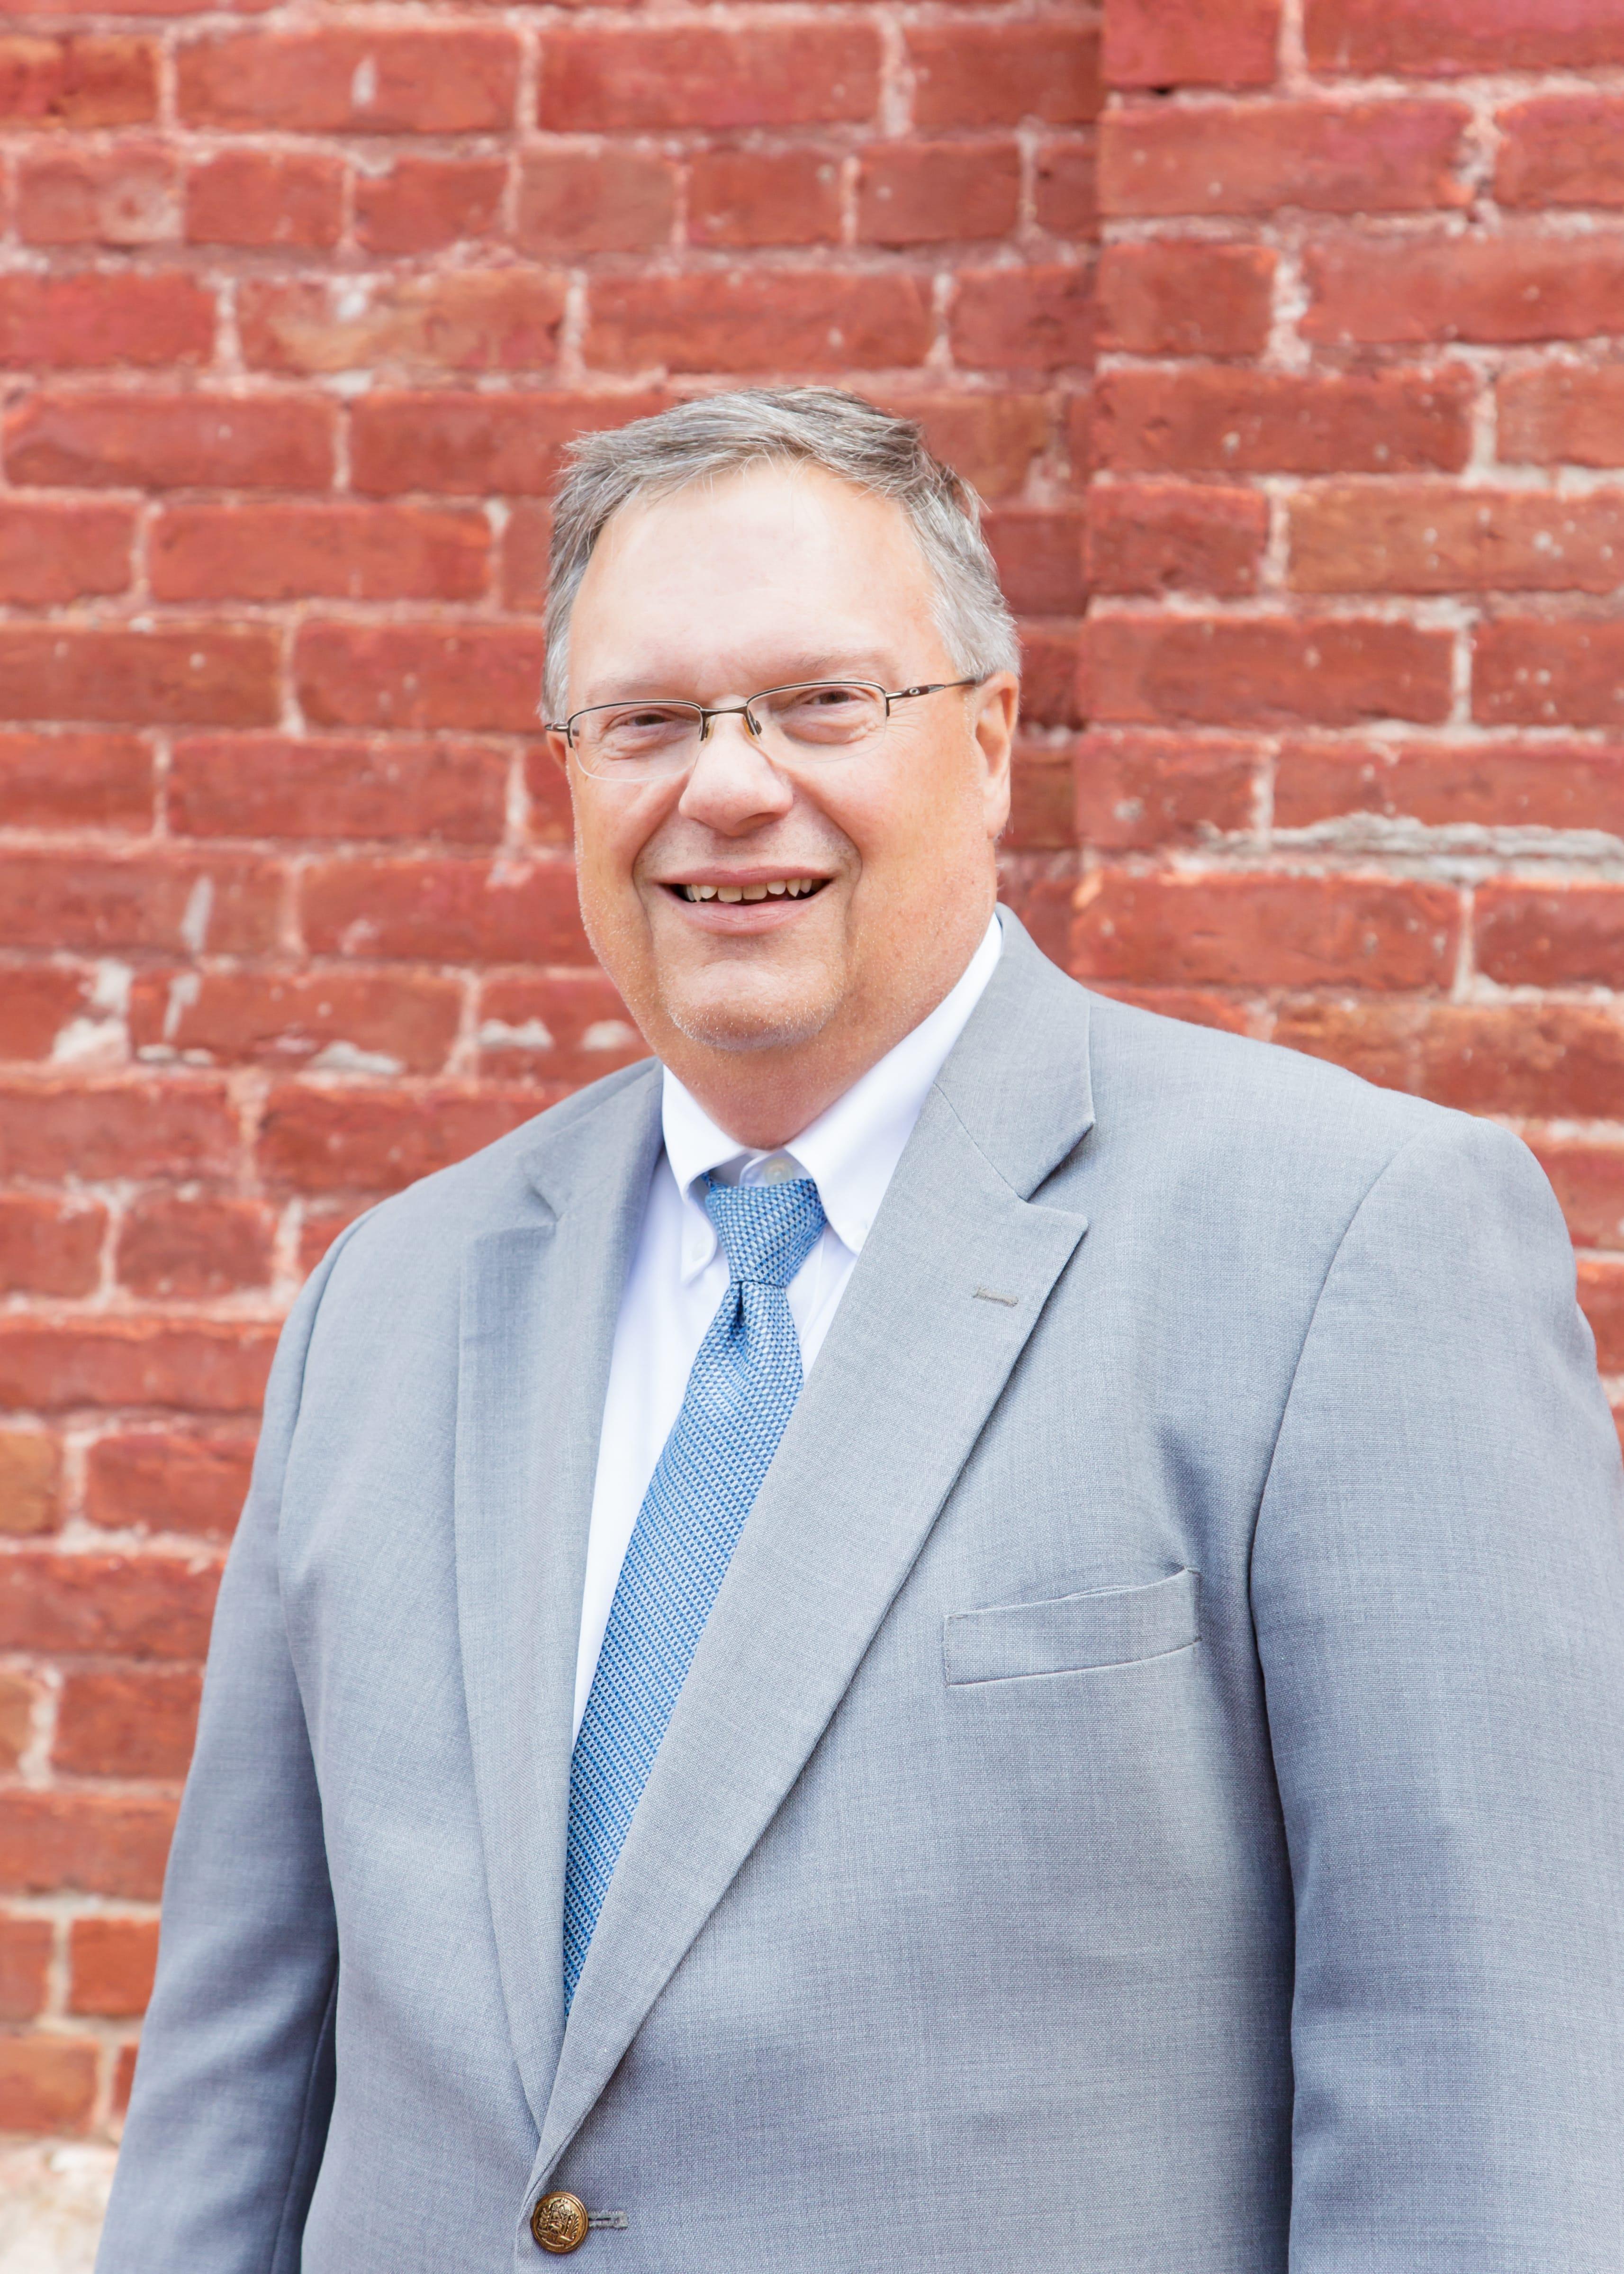 Michael J. Toms